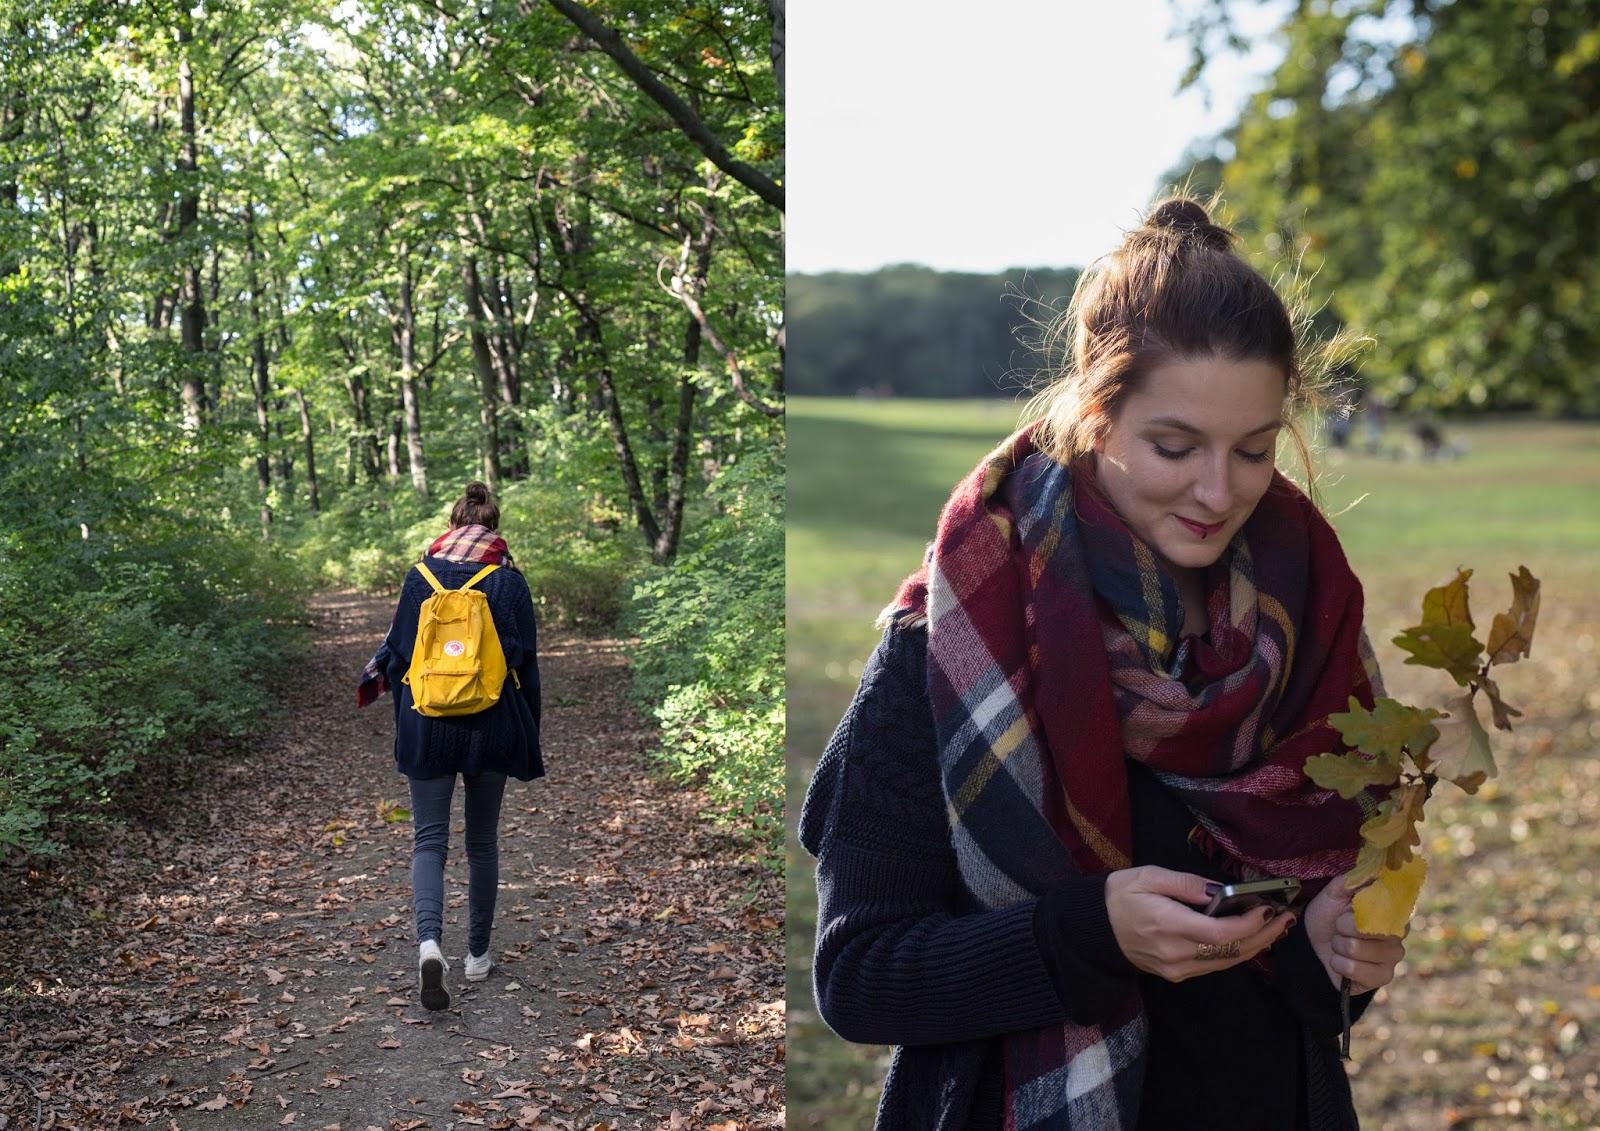 Waldspaziergang im Herbst - Berlin Volkspark Jungfernheide